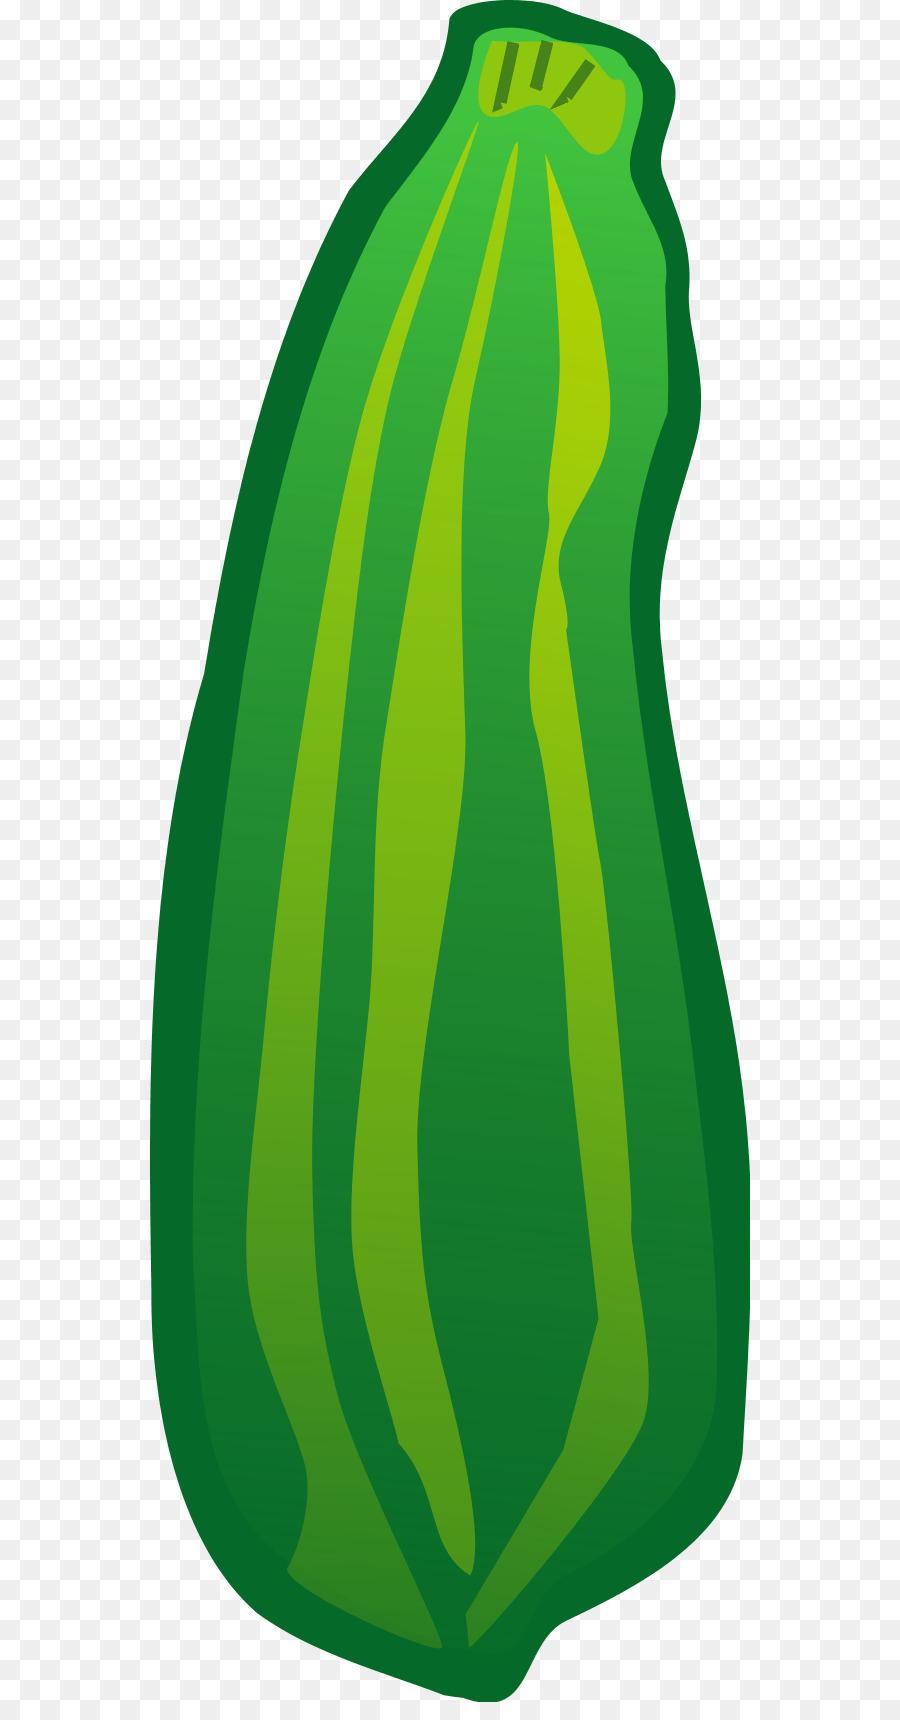 zucchini stuffed squash pickled cucumber vegetable clip art rh kisspng com zucchini clipart images zucchini plant clipart